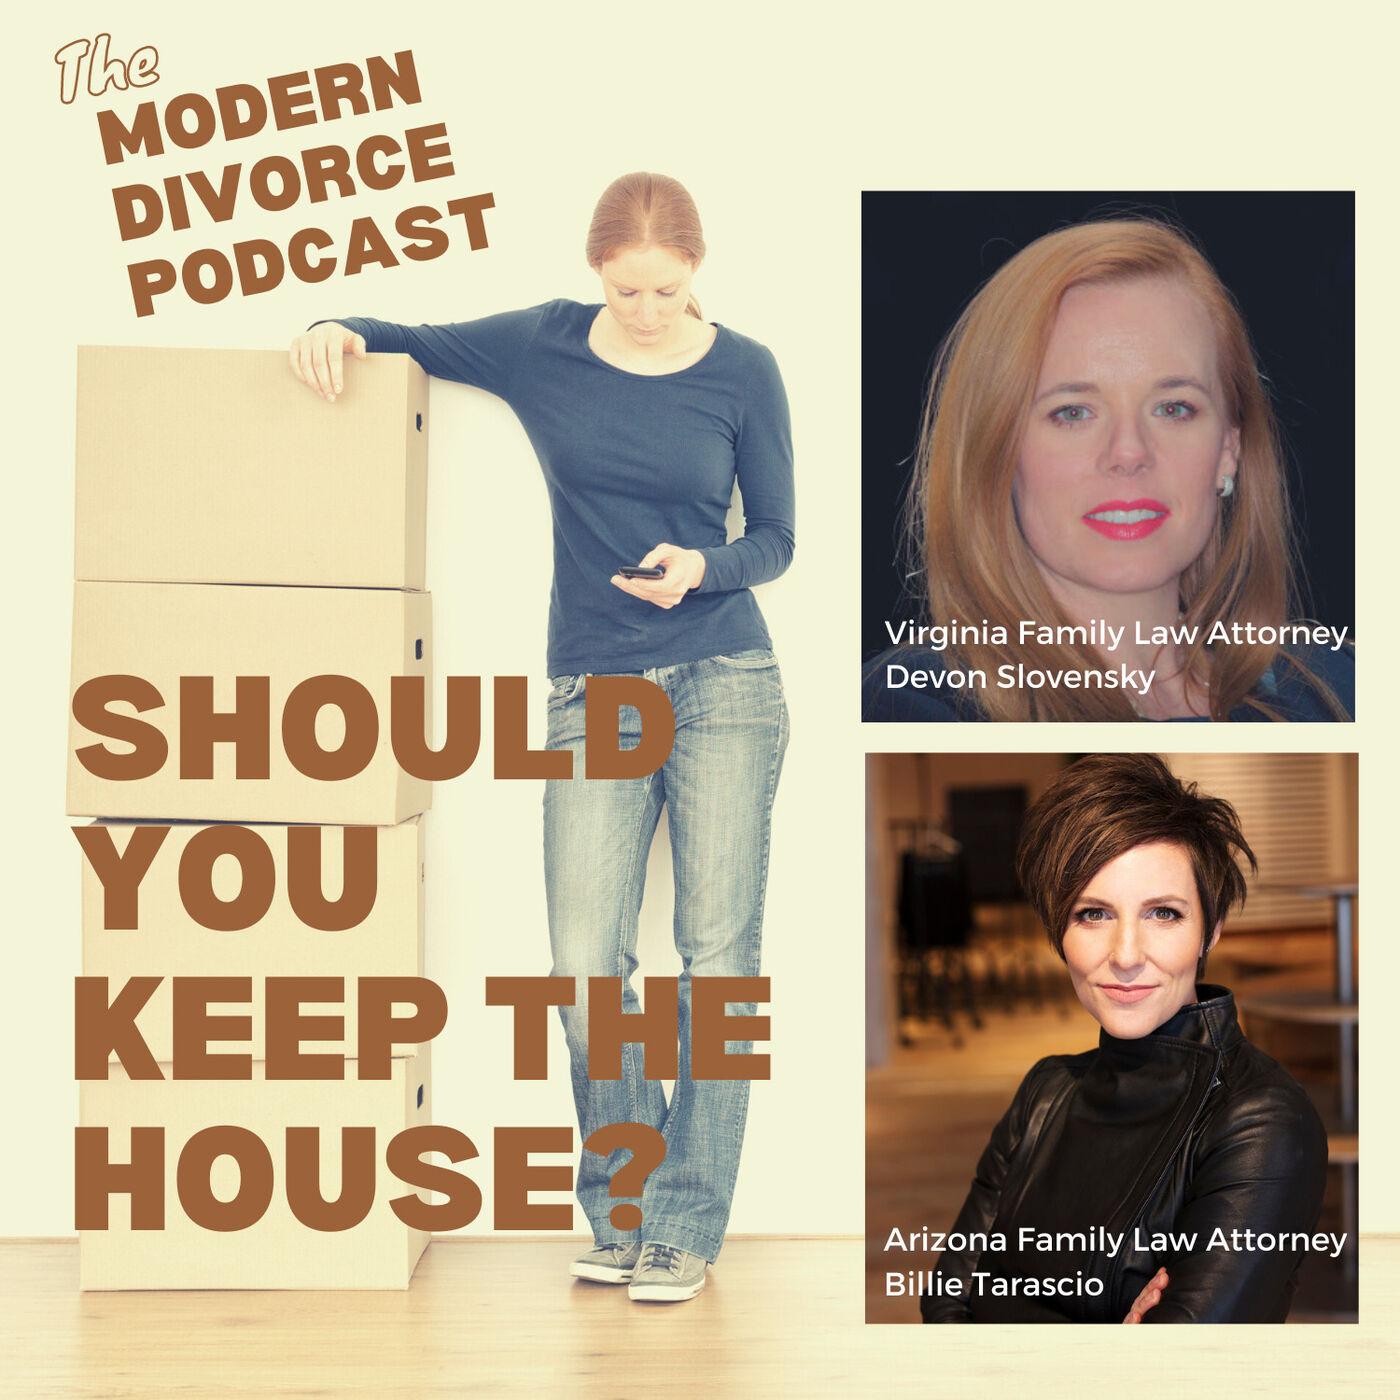 Modern Divorce: Should you keep the house?